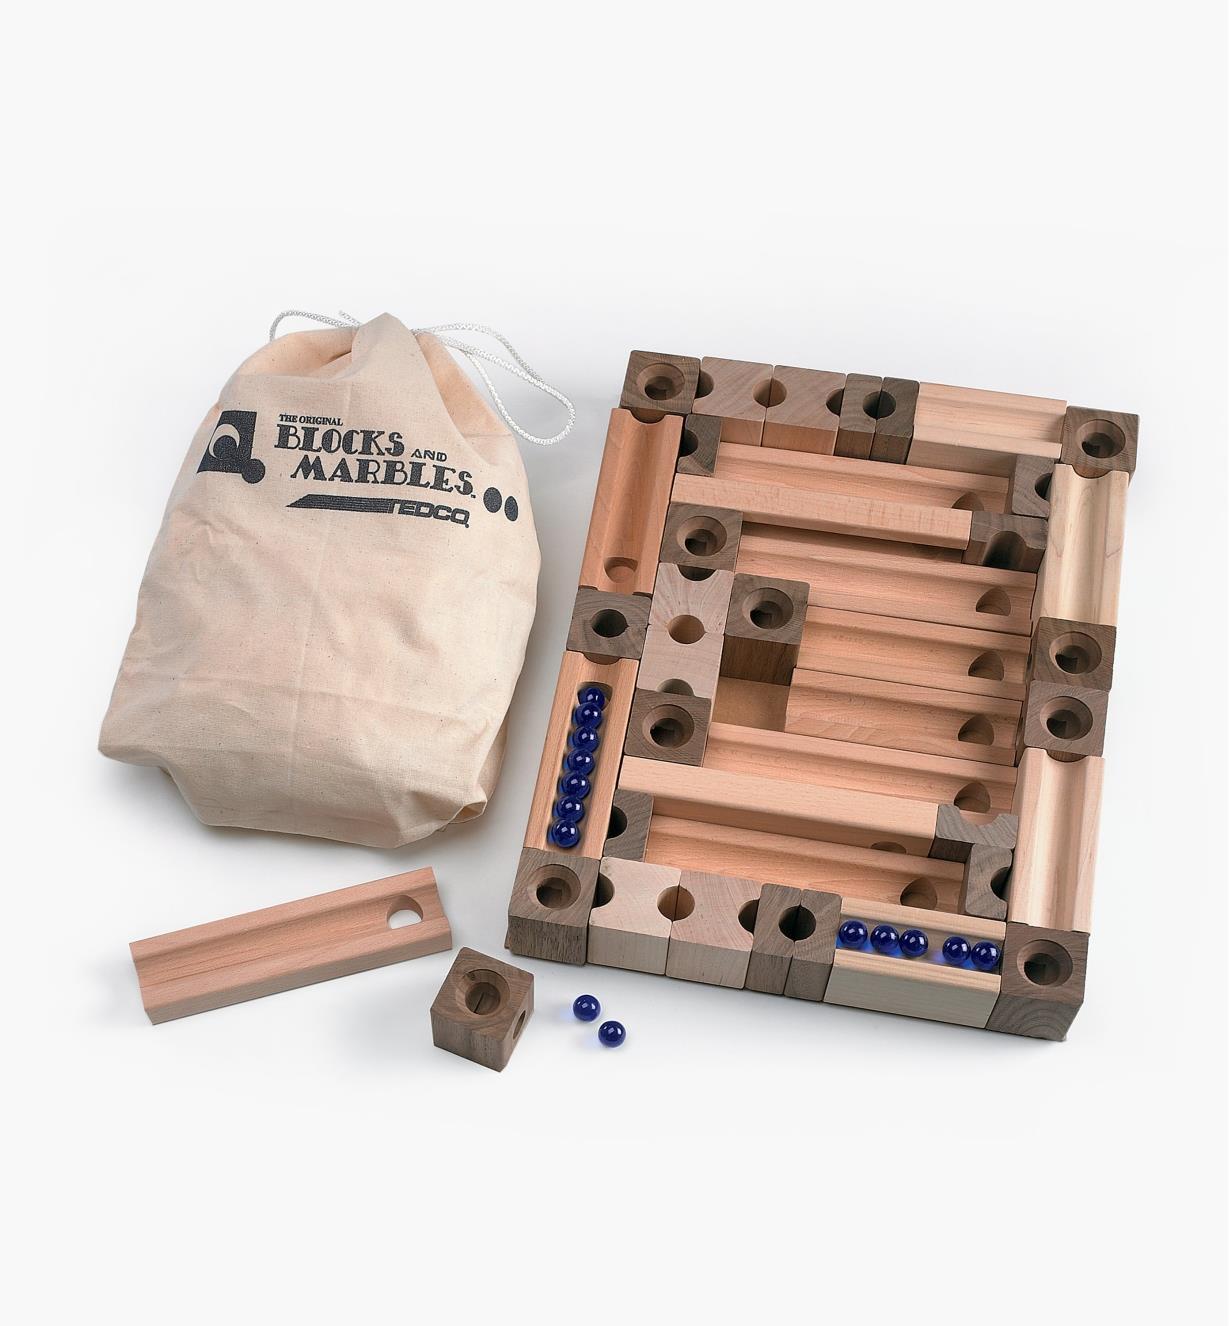 45K4012 - Blocks and Marbles Super Set